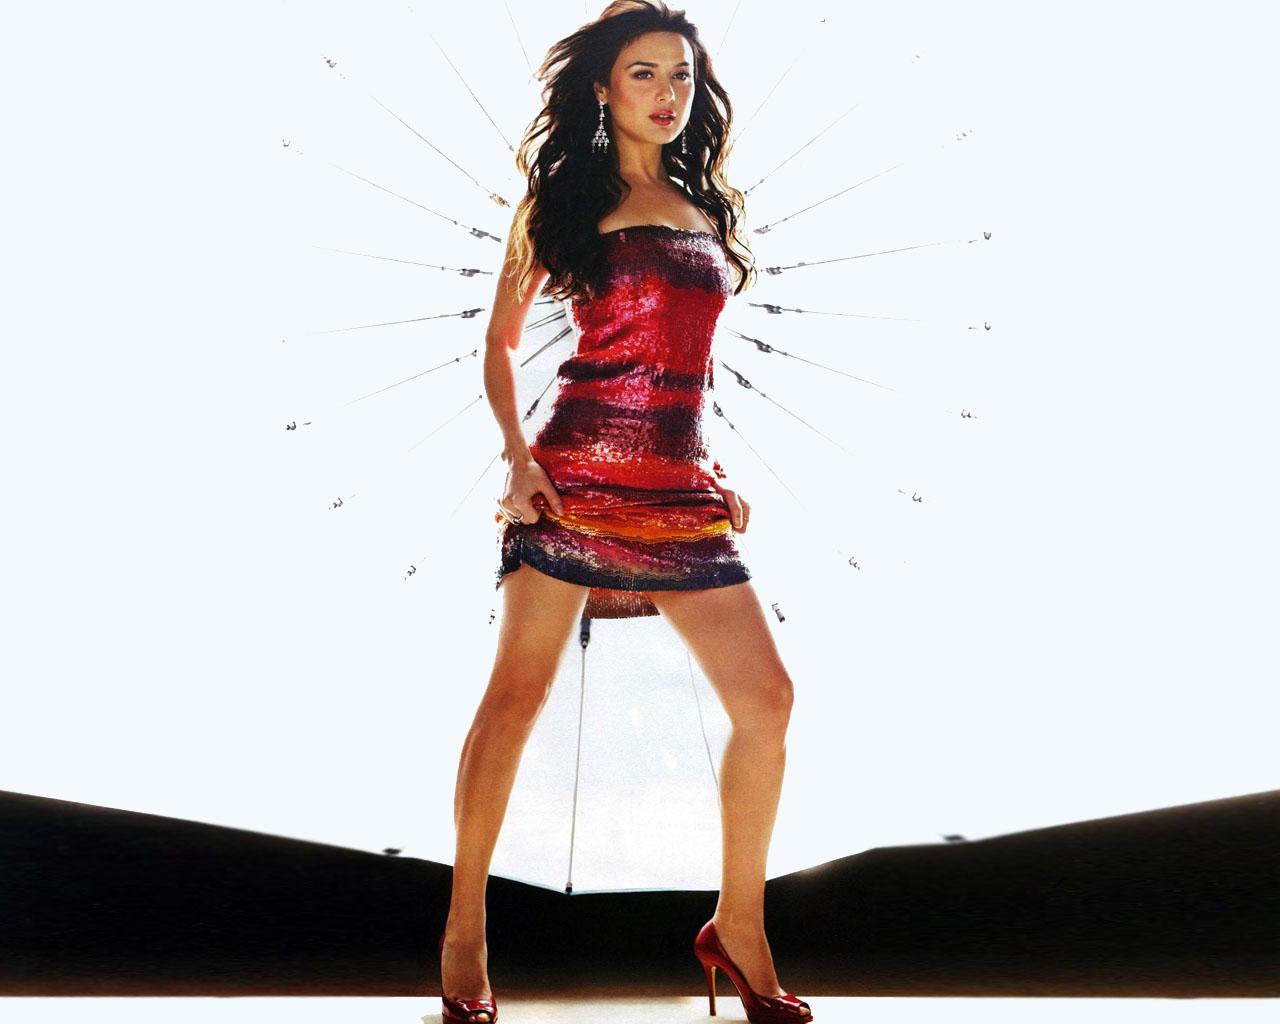 Preity Zinta Hot Leaked Bikini Photos, Hd Images-3428